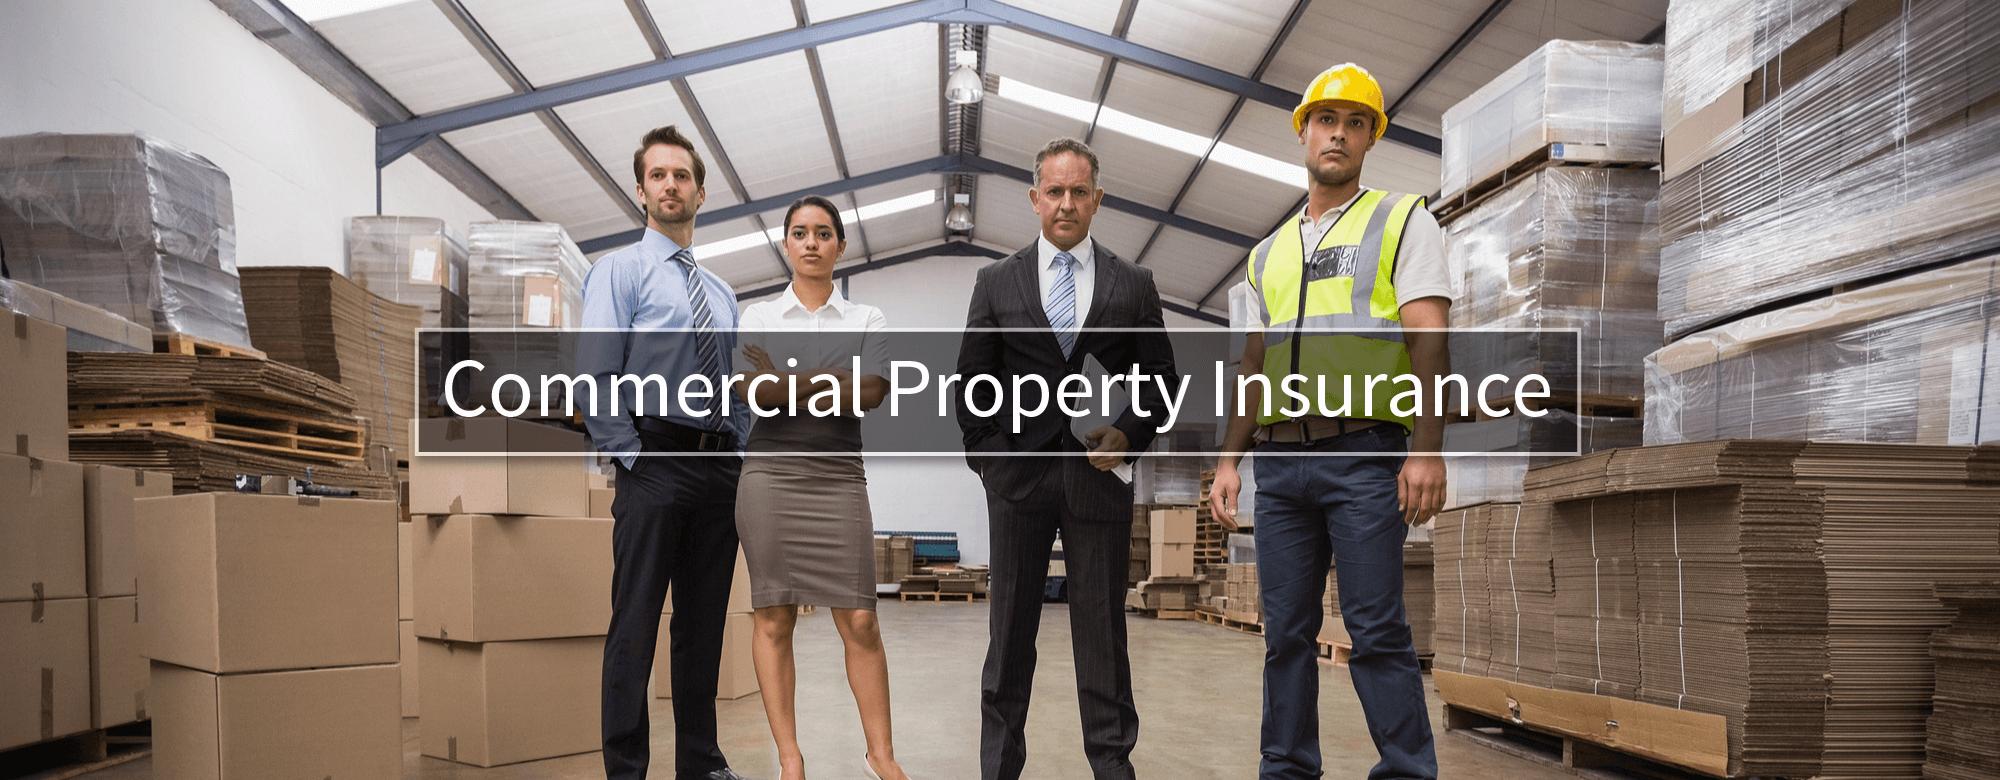 Commercial Property Header